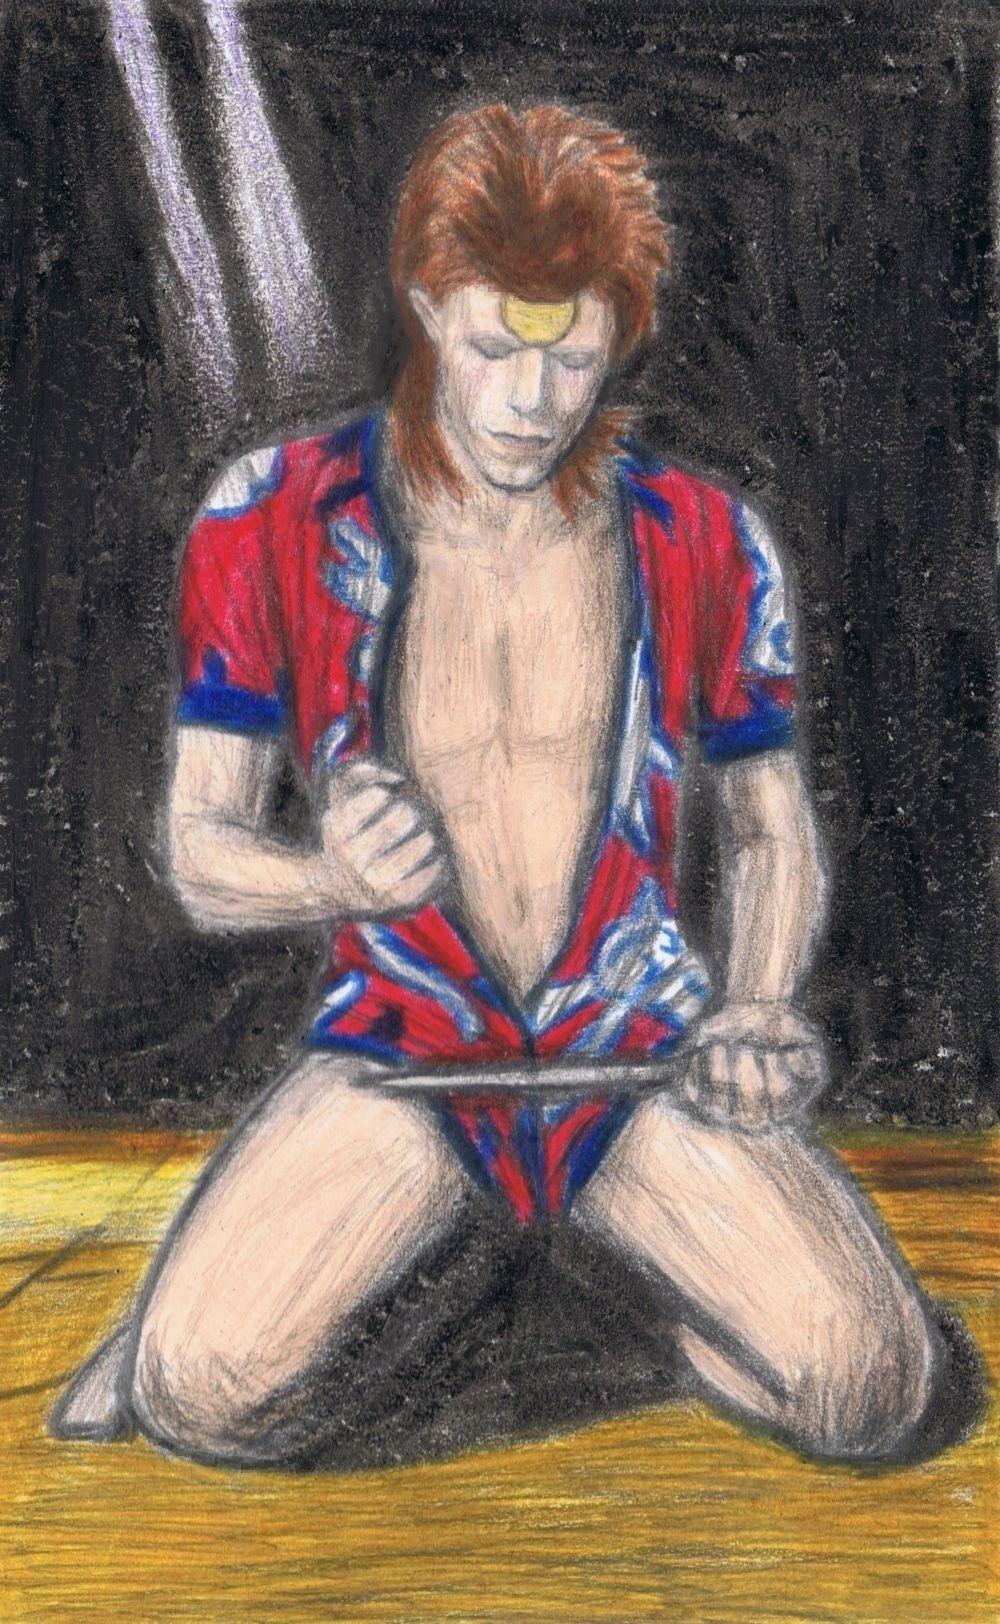 Ziggy Stardust Rock 'n' Roll Suicide by gagambo